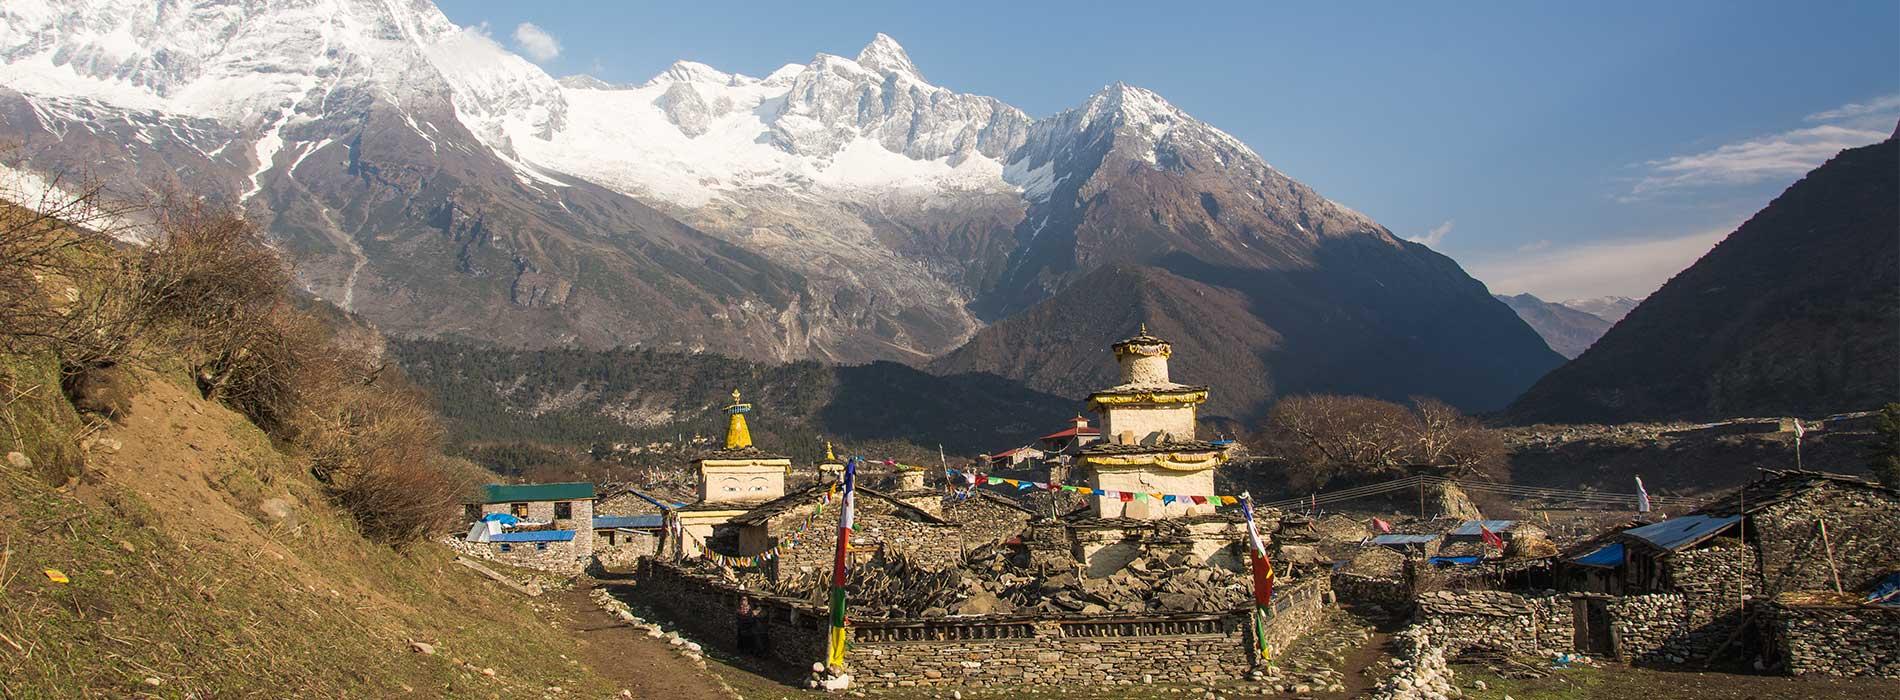 Manaslu Trek: A great walk within nature